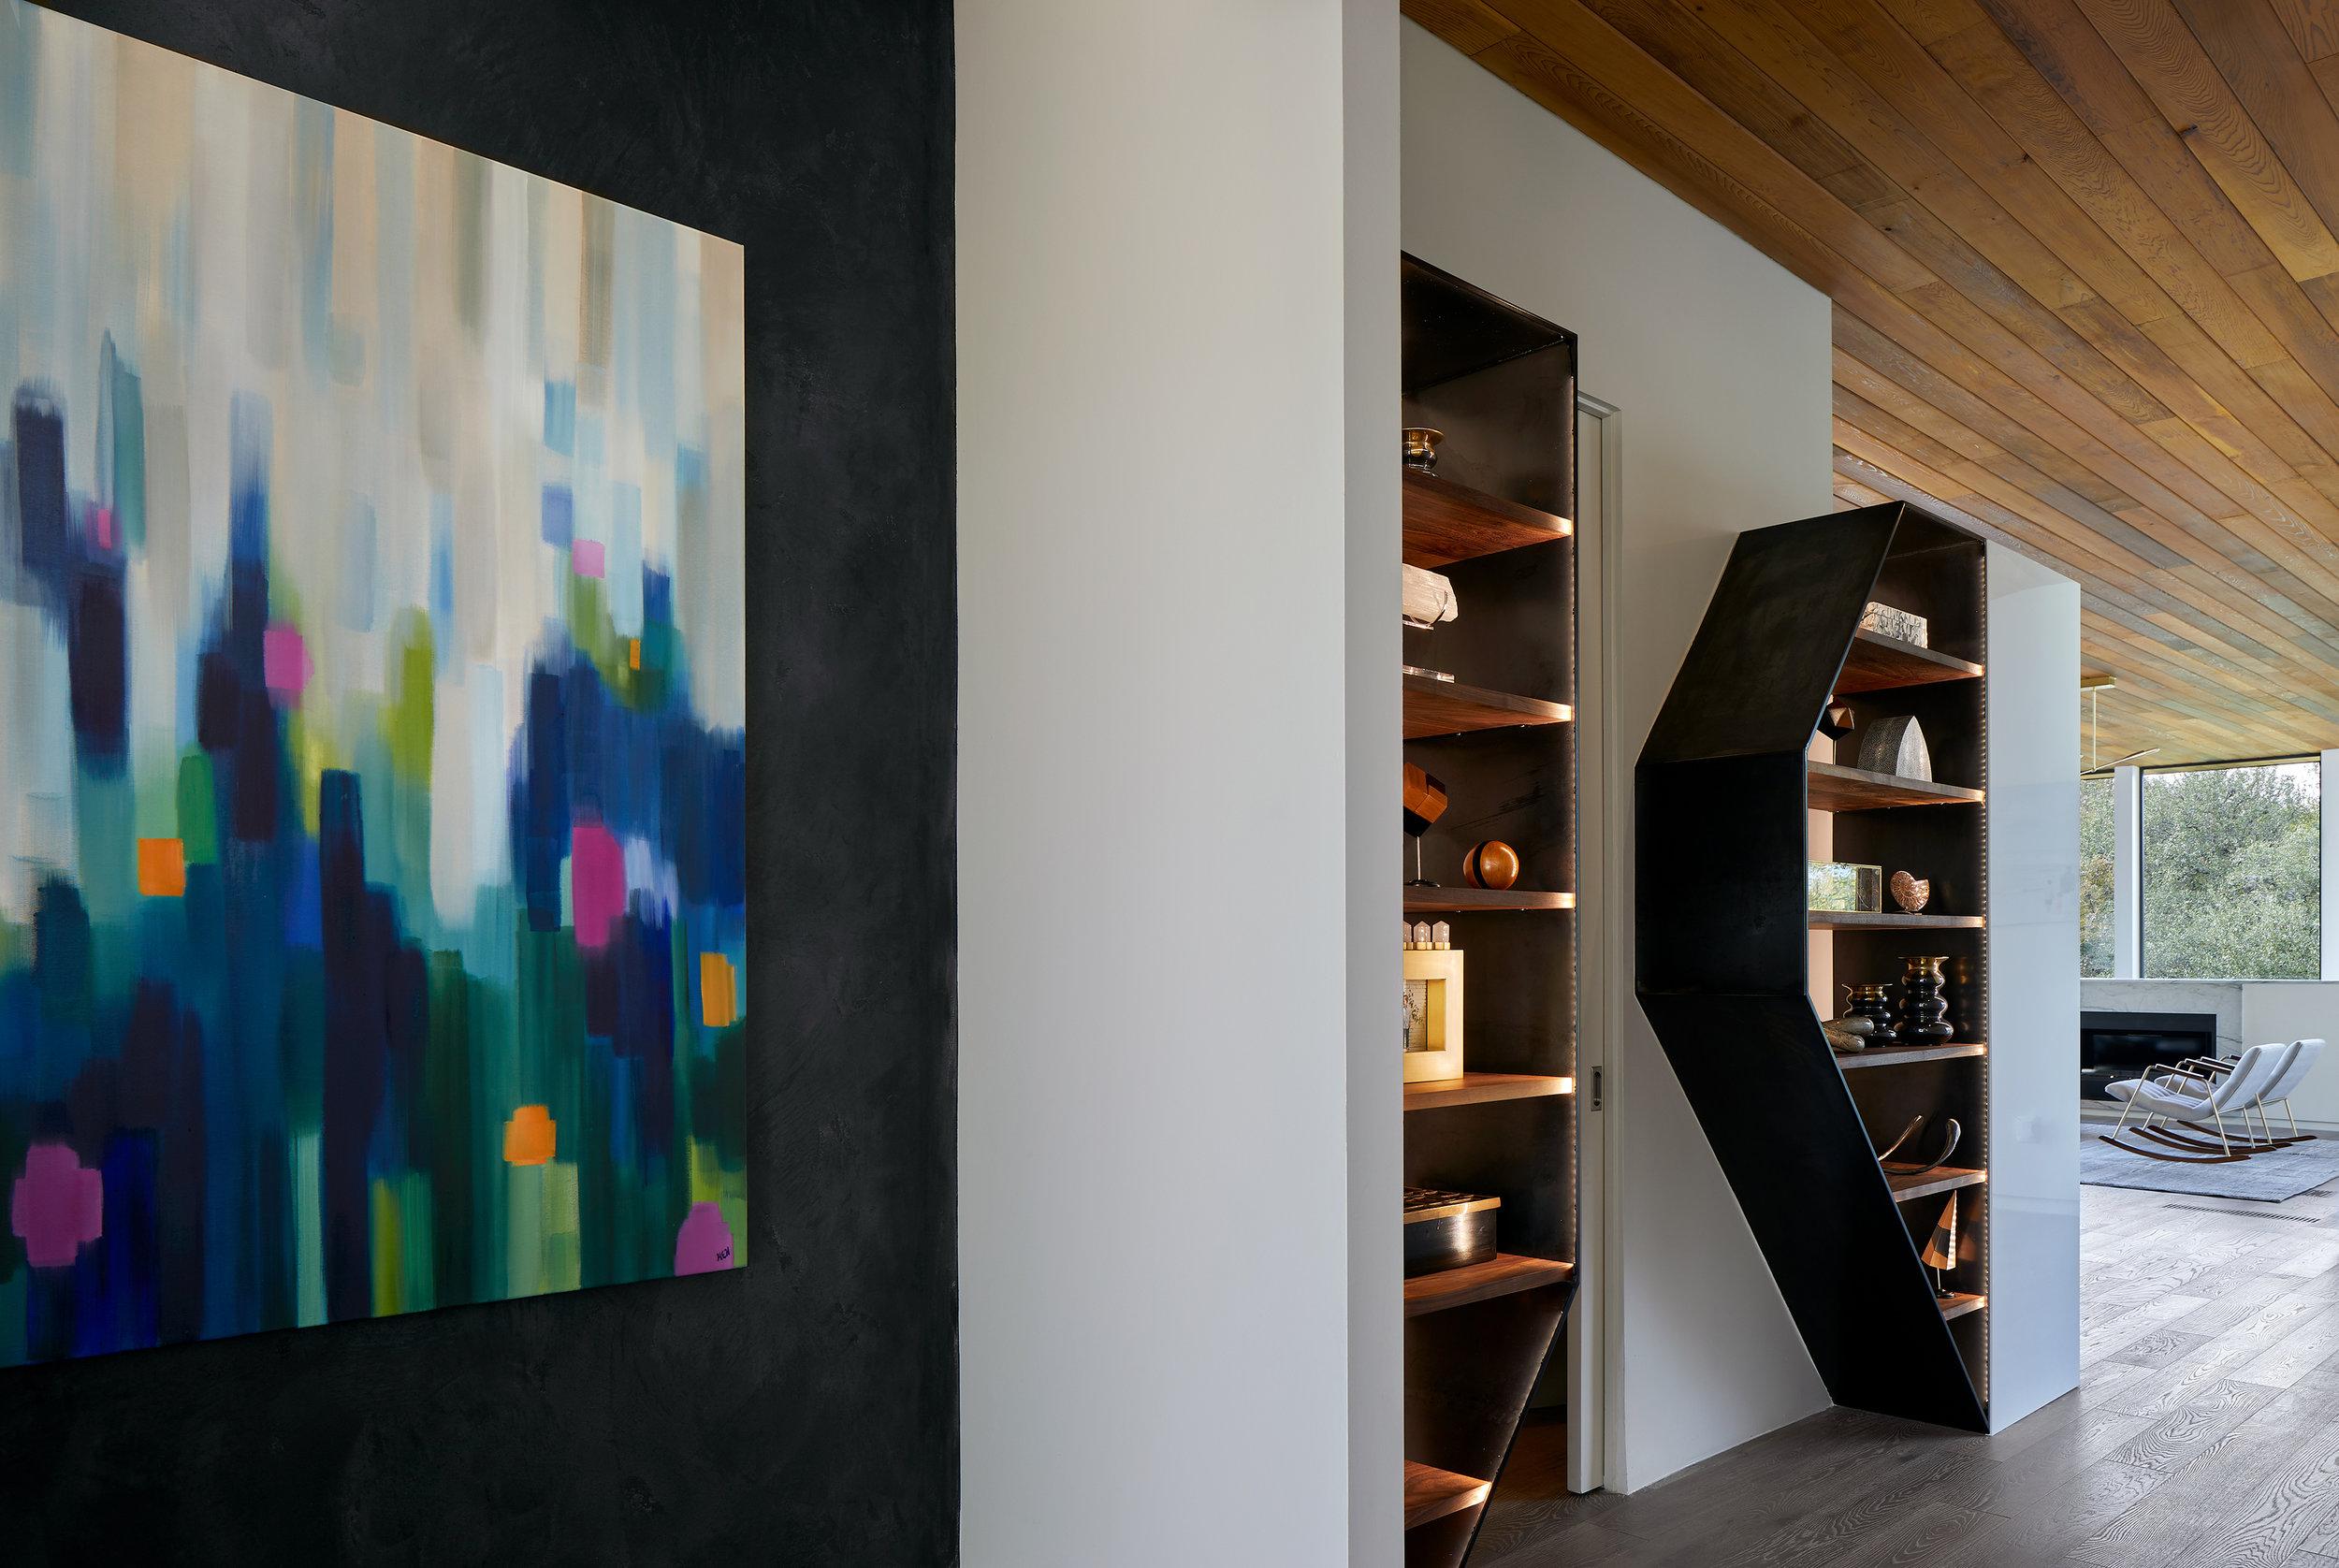 Matt Fajkus MF Architecture Bracketed Space House 2 by Dror Baldinger.jpg